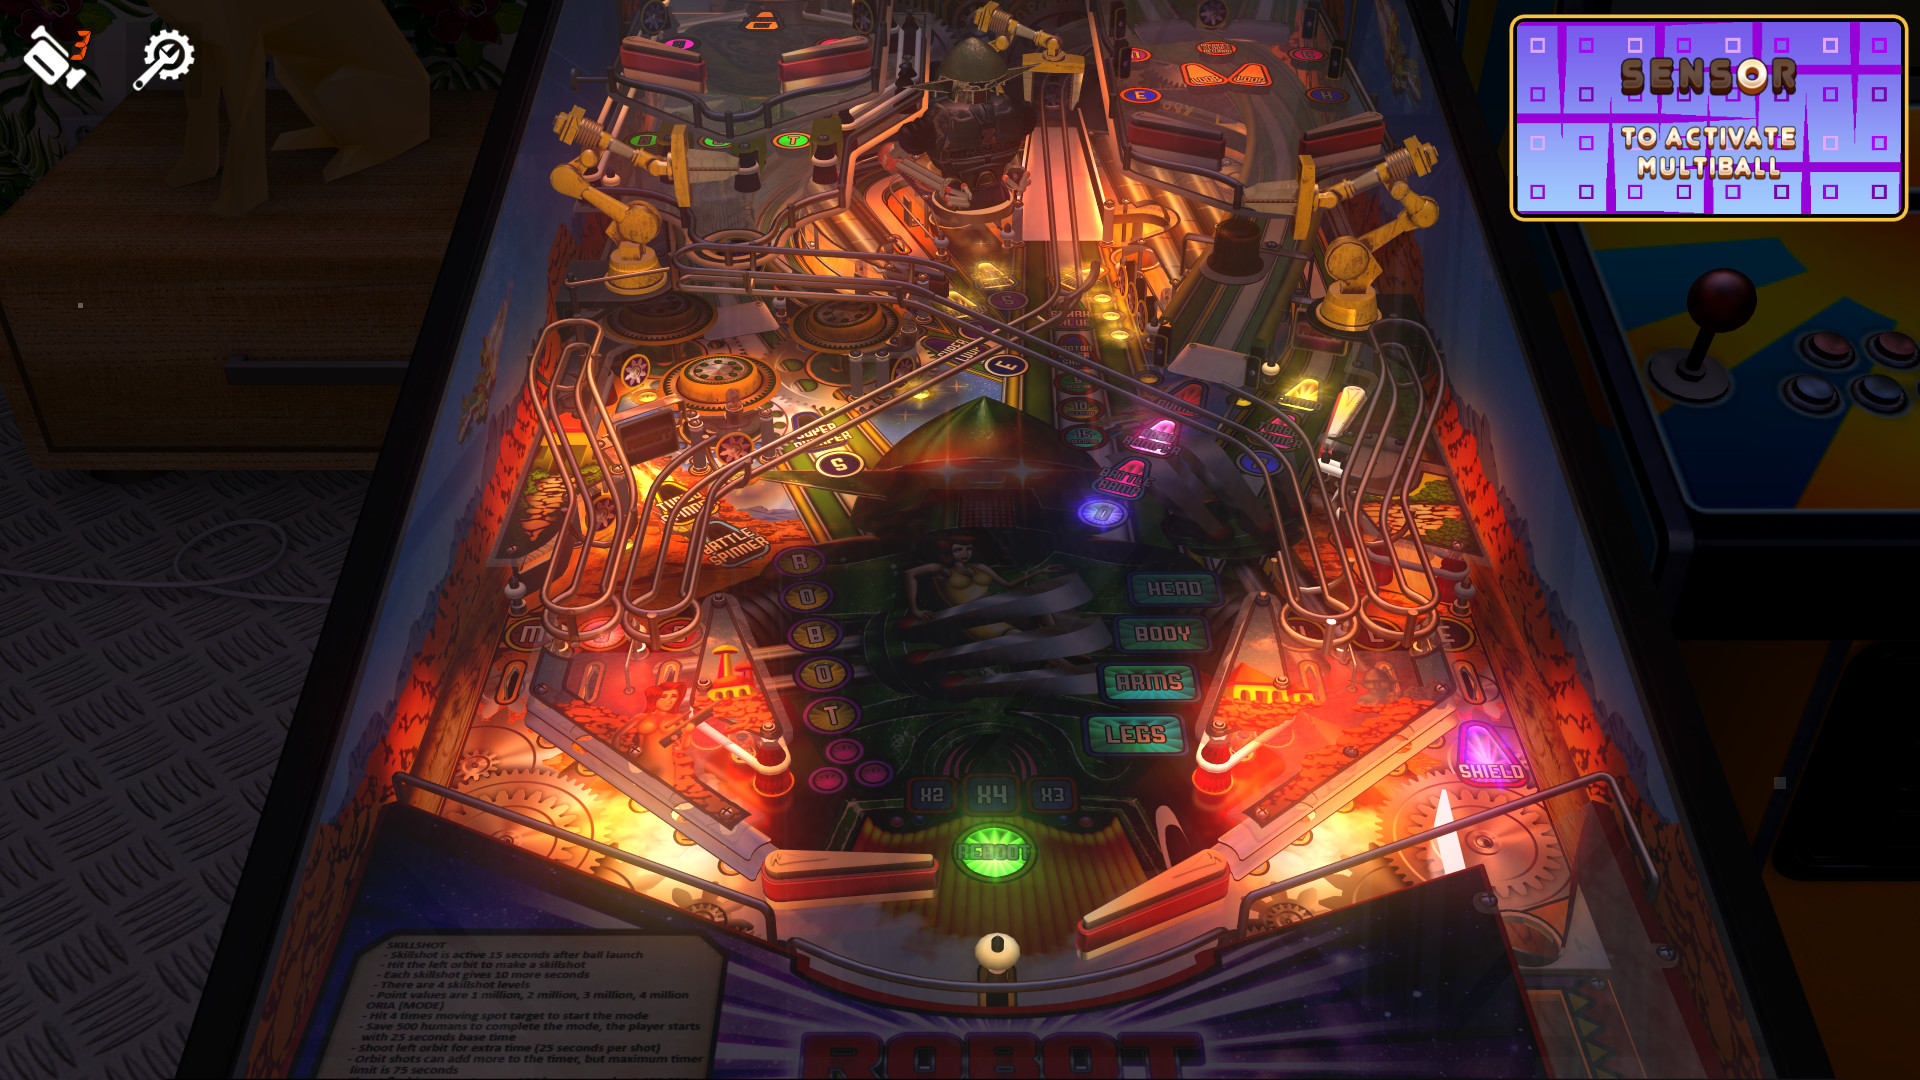 Zaccaria Pinball - Robot Deluxe Pinball Table screenshot